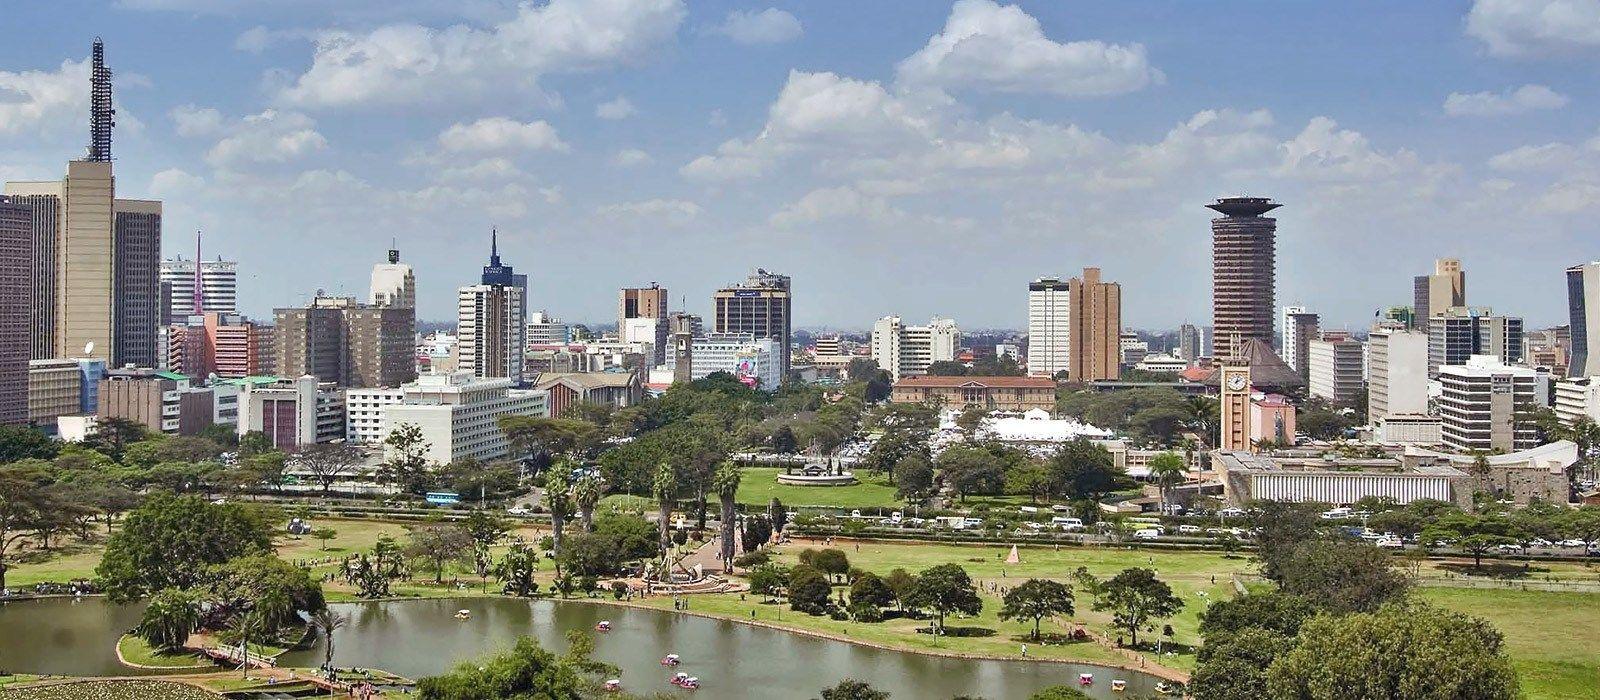 Safari Highlights of Kenya Tour Trip 2